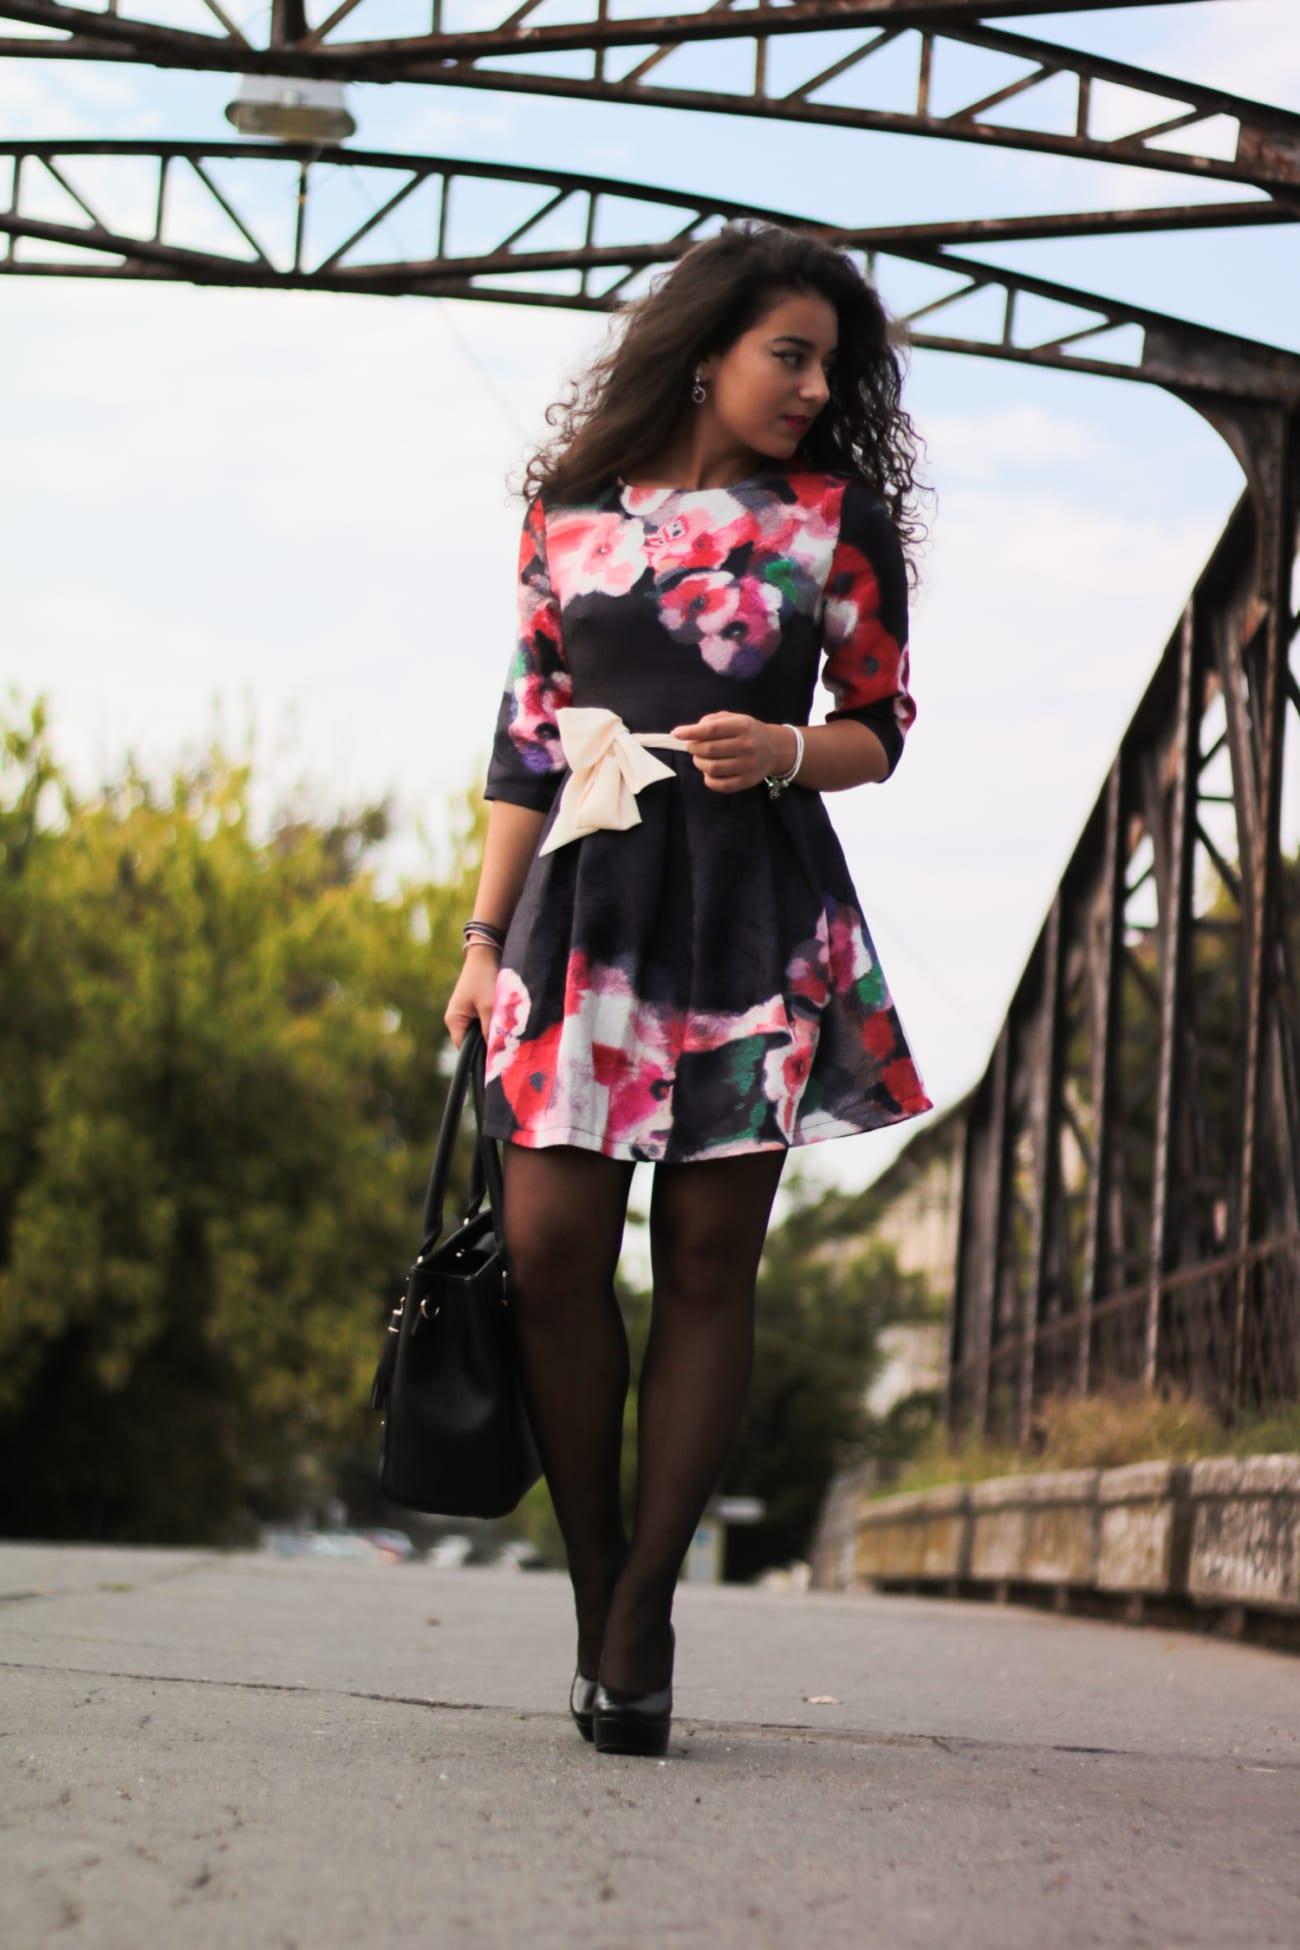 top-fashion-pareri-roxi-rose-timisoara-fashion-blogger-rochia-cu-flori-floral-dress-review-favorite-fashion-item-and-why-clothing-piece